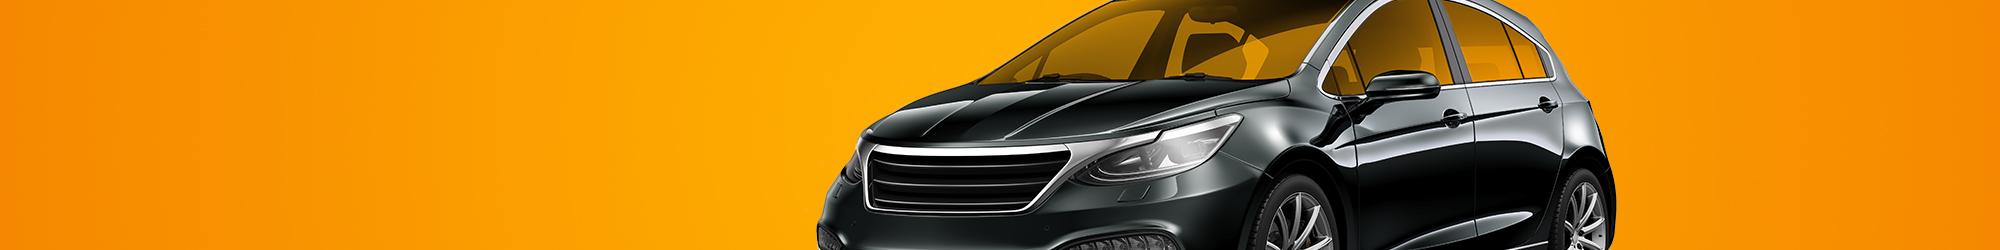 Category Banner - Automotive